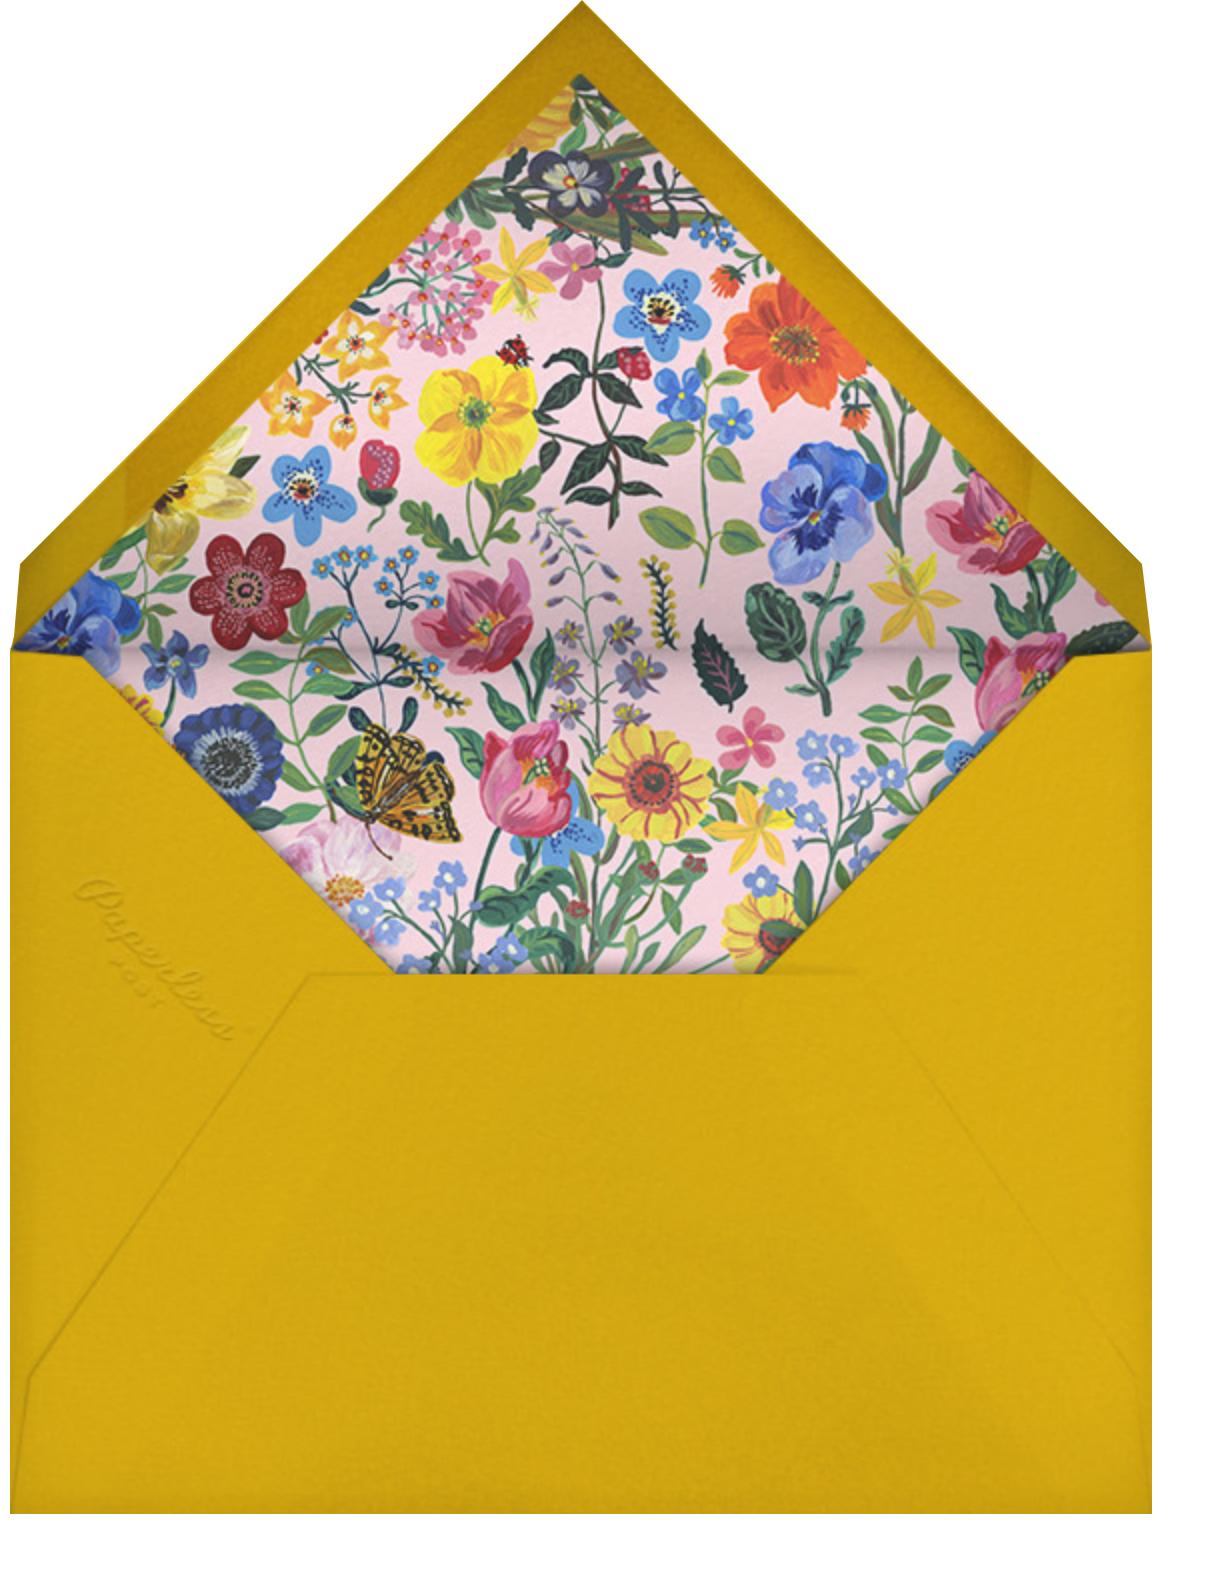 Jardin de Rêves - White - Nathalie Lété - Adult birthday - envelope back